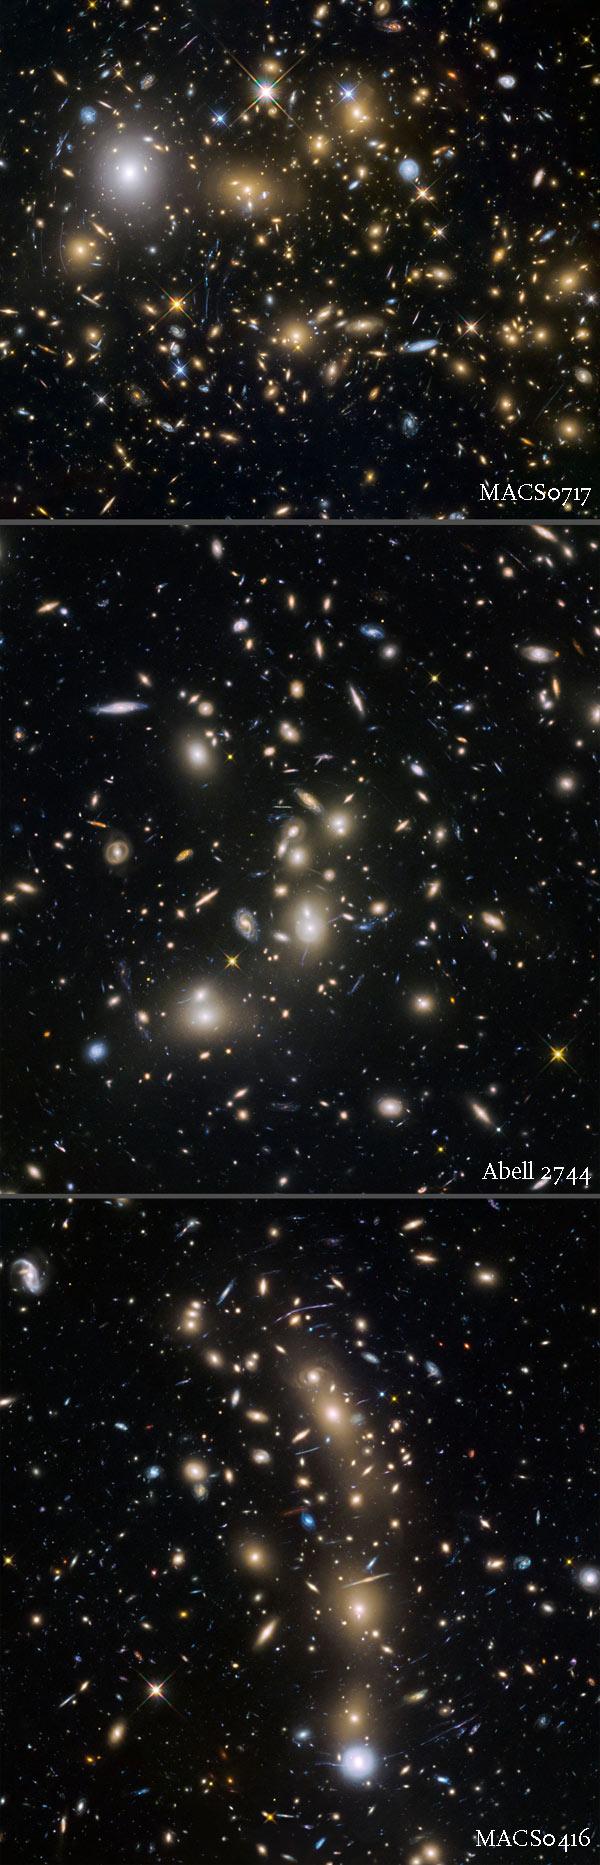 three galaxy clusters